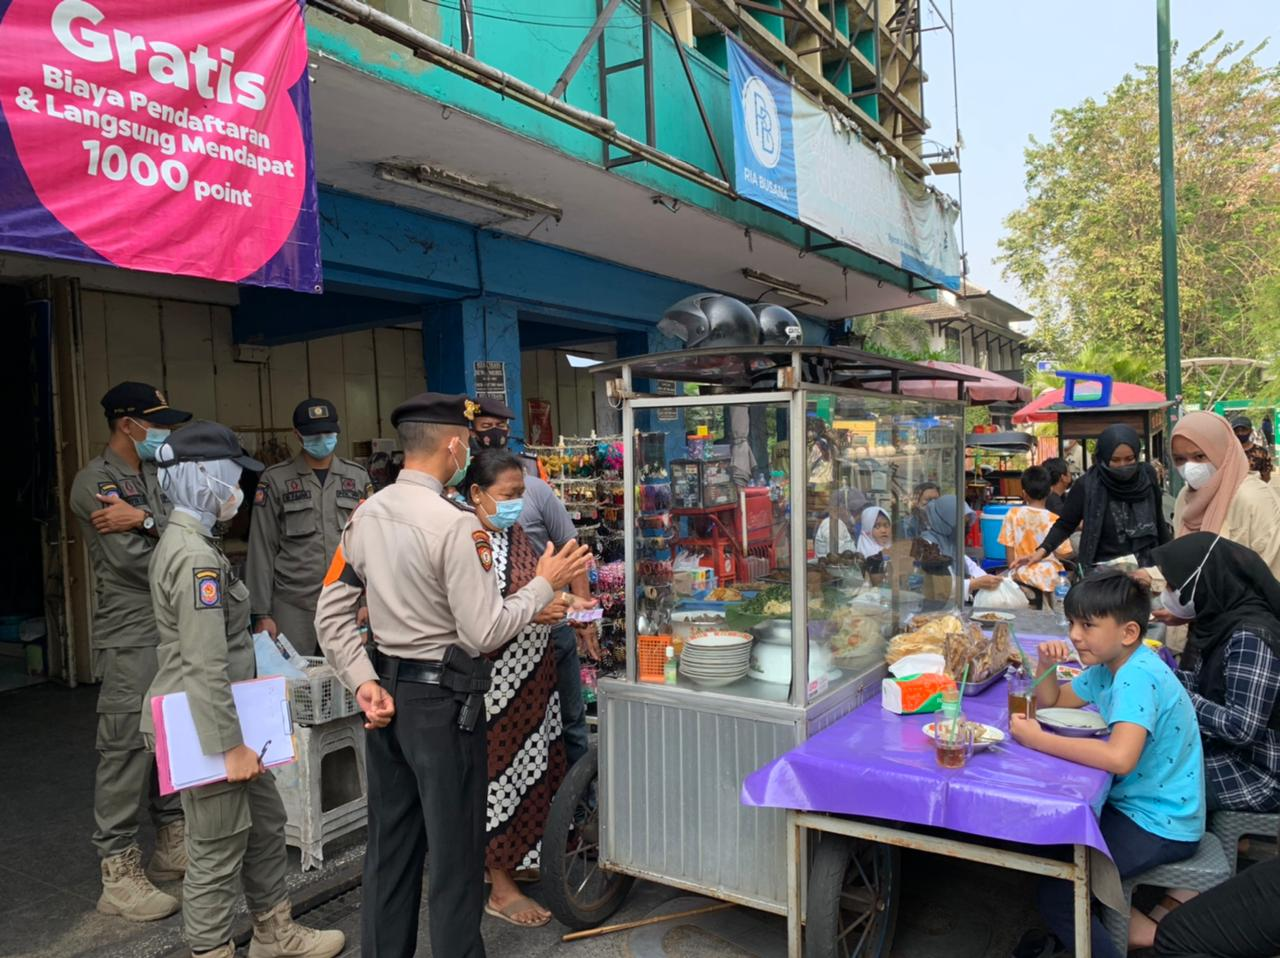 Pol PPPariwisata Kota Yogyakarta Bersama Polisi Pariwisata Polresta Yogyakarta Melaksanakan Kegiatan Terpadu di Kawasan Malioboro Yogyakarta